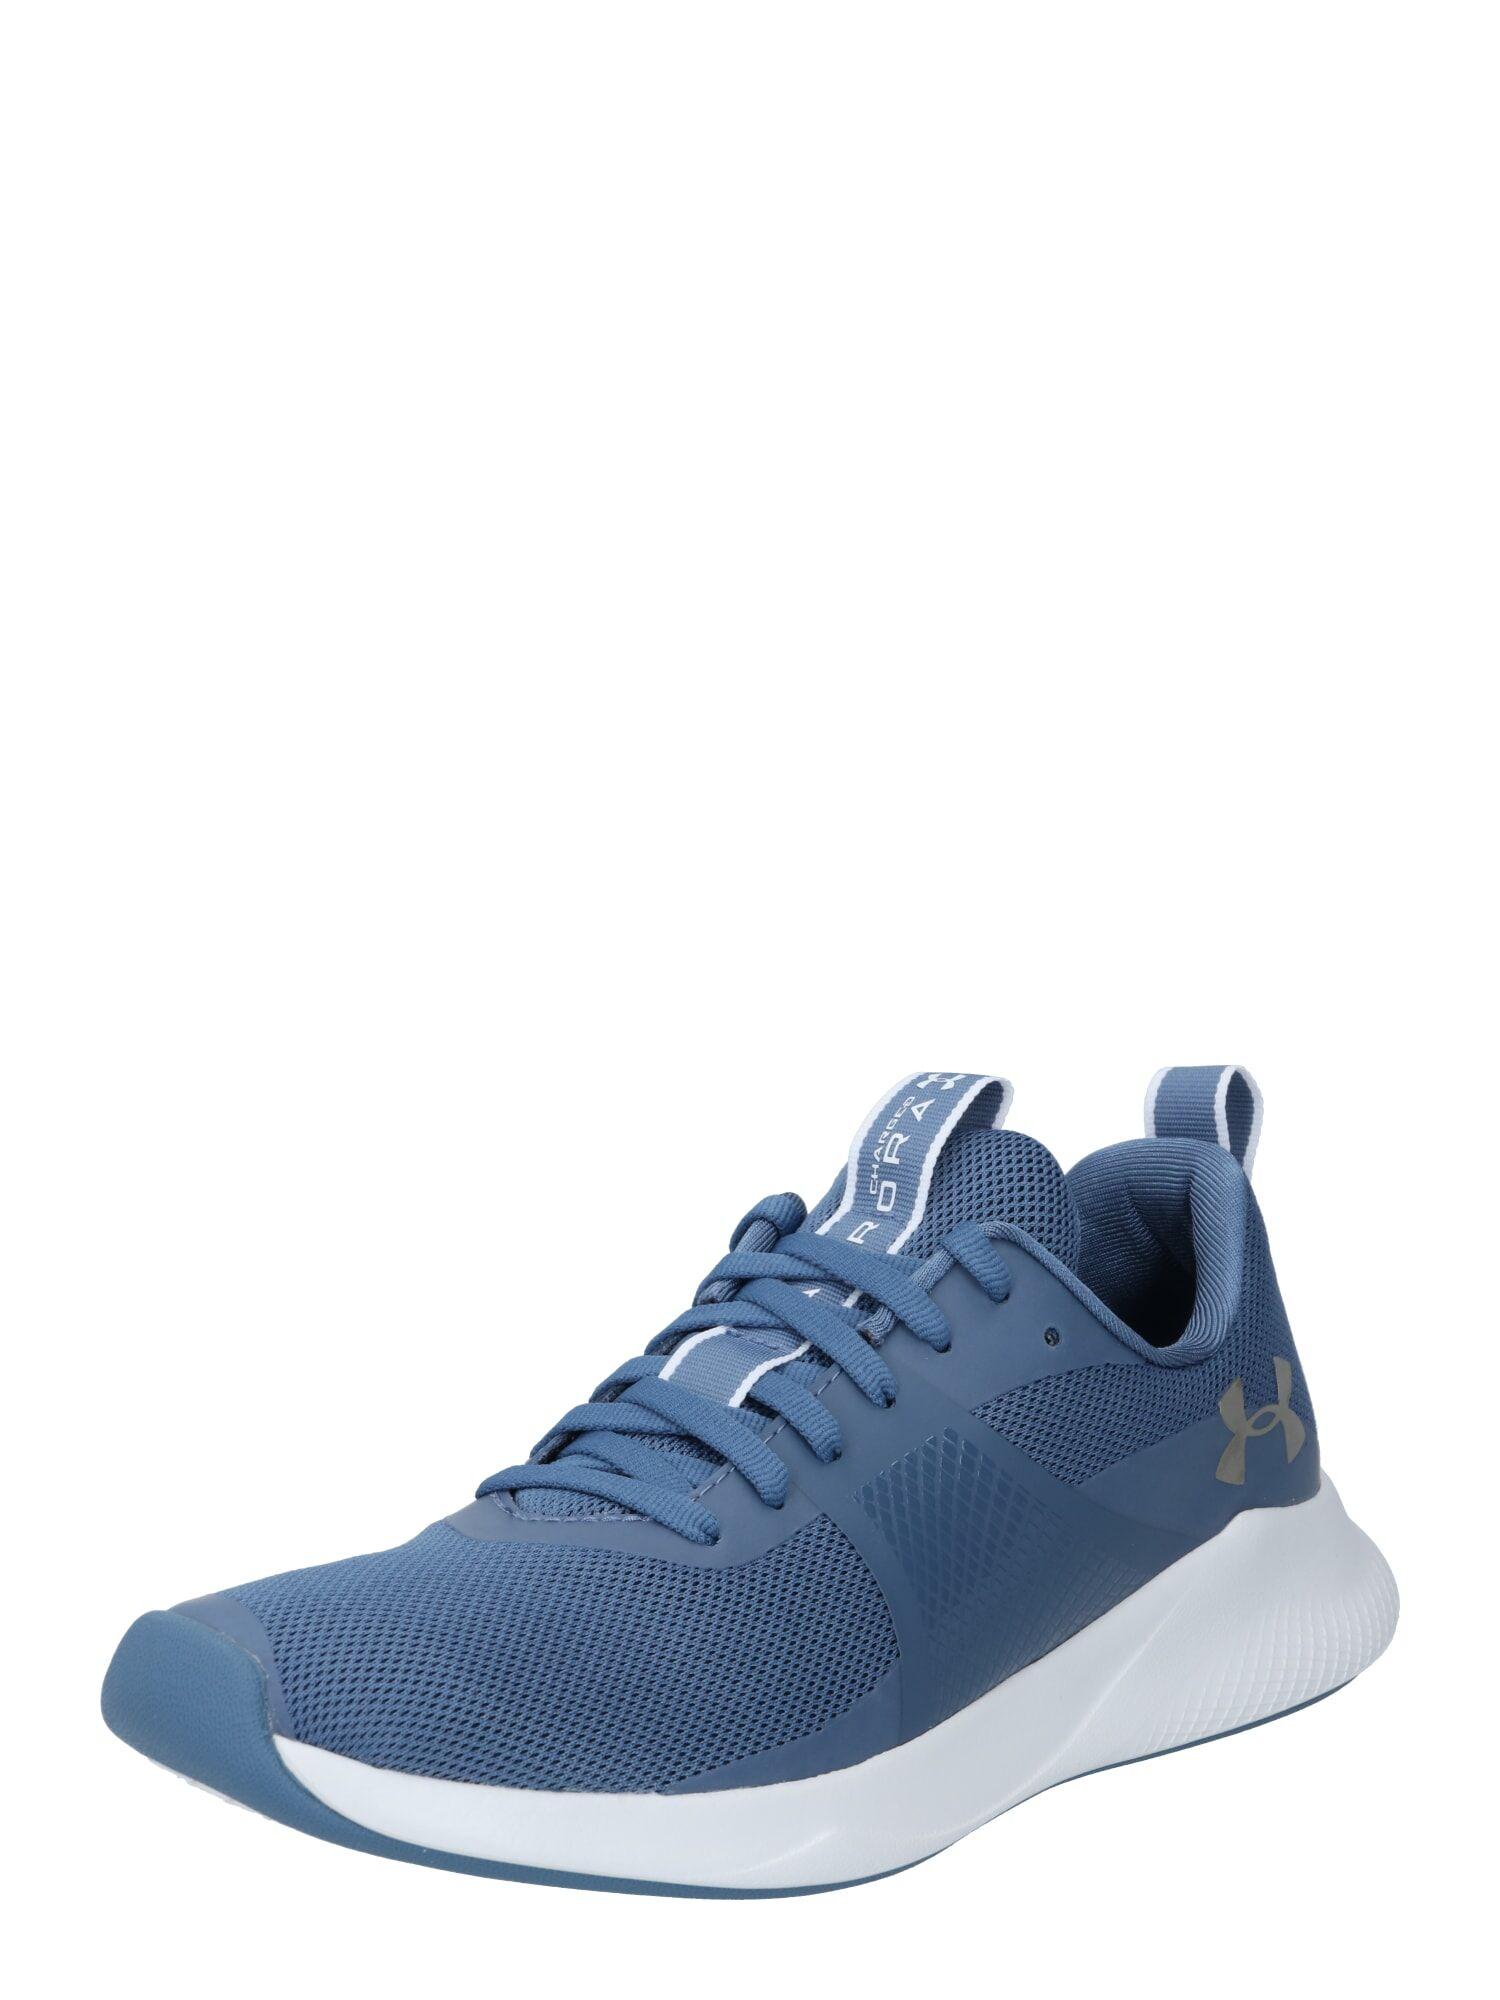 UNDER ARMOUR Chaussure de sport 'Aurora'  - Bleu - Taille: 9.5 - female